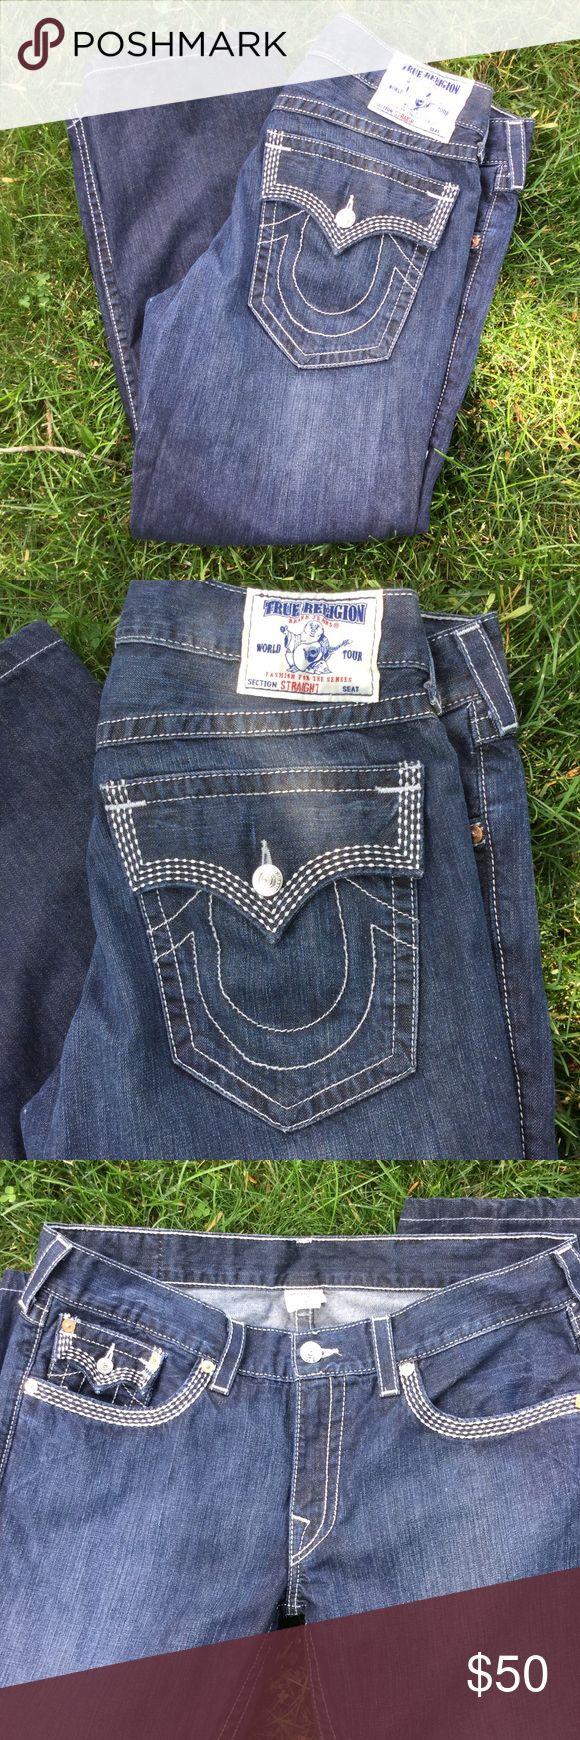 True Religion Joey Jeans Mint Condition True Religion Joey Straight Men's Jeans size 38. Back Button Flap Pockets. True Religion Jeans Straight